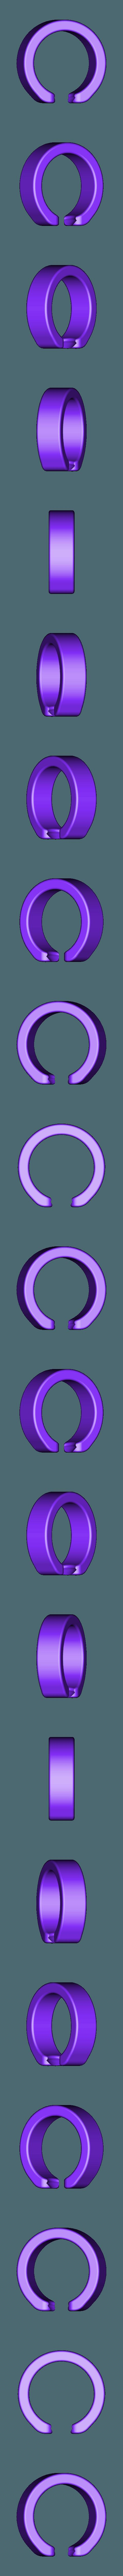 Charm Ring.stl Download free STL file Charm Ring • 3D printable model, Lucy_Haribert